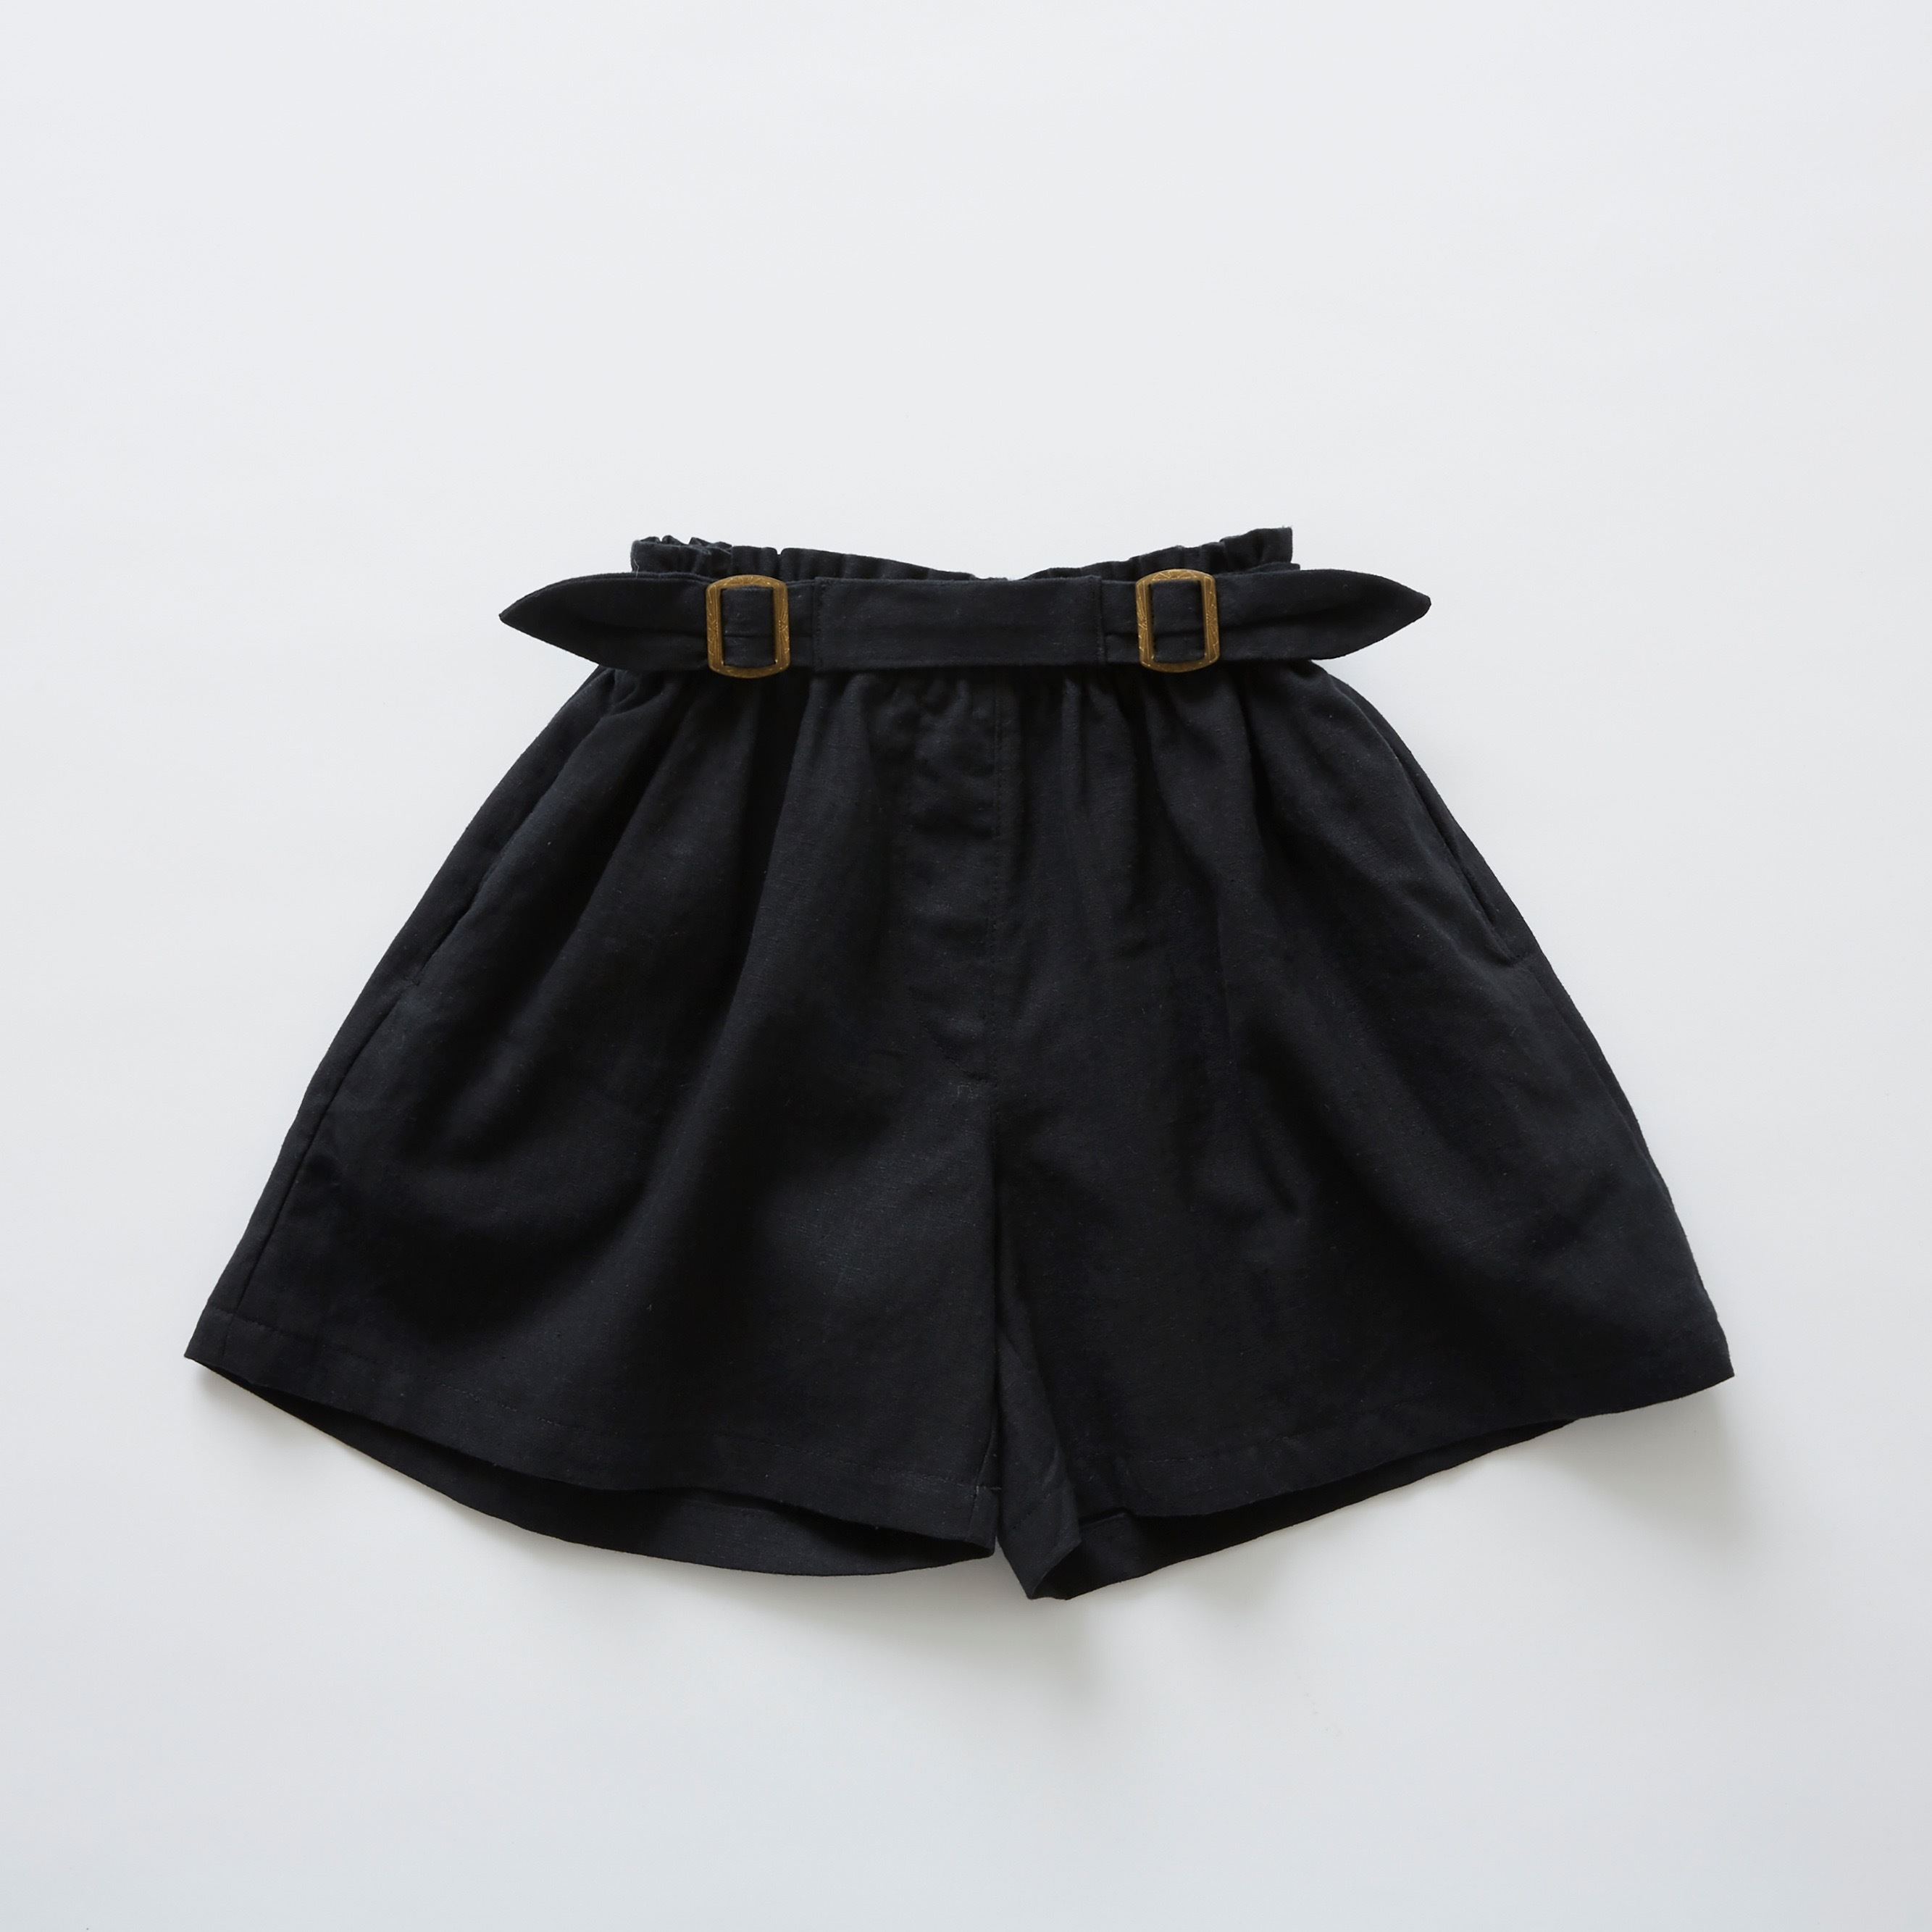 《eLfinFolk 2019SS》linen canvas culotte pants / black / 90-100cm